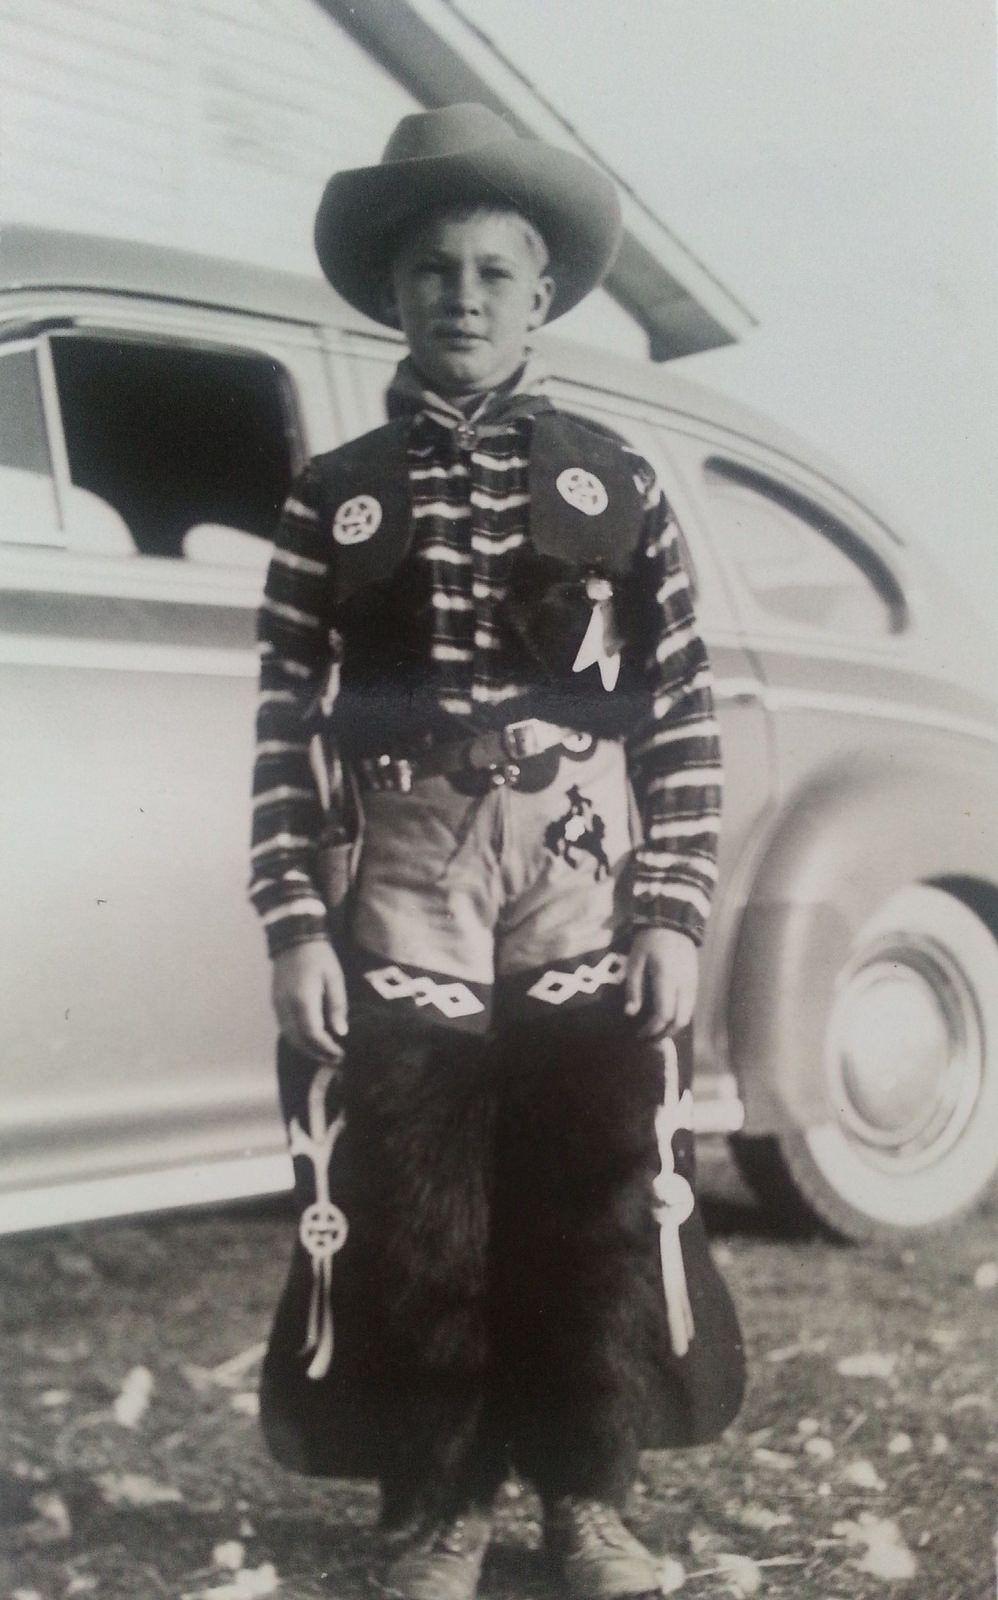 Cowboy, 1940's